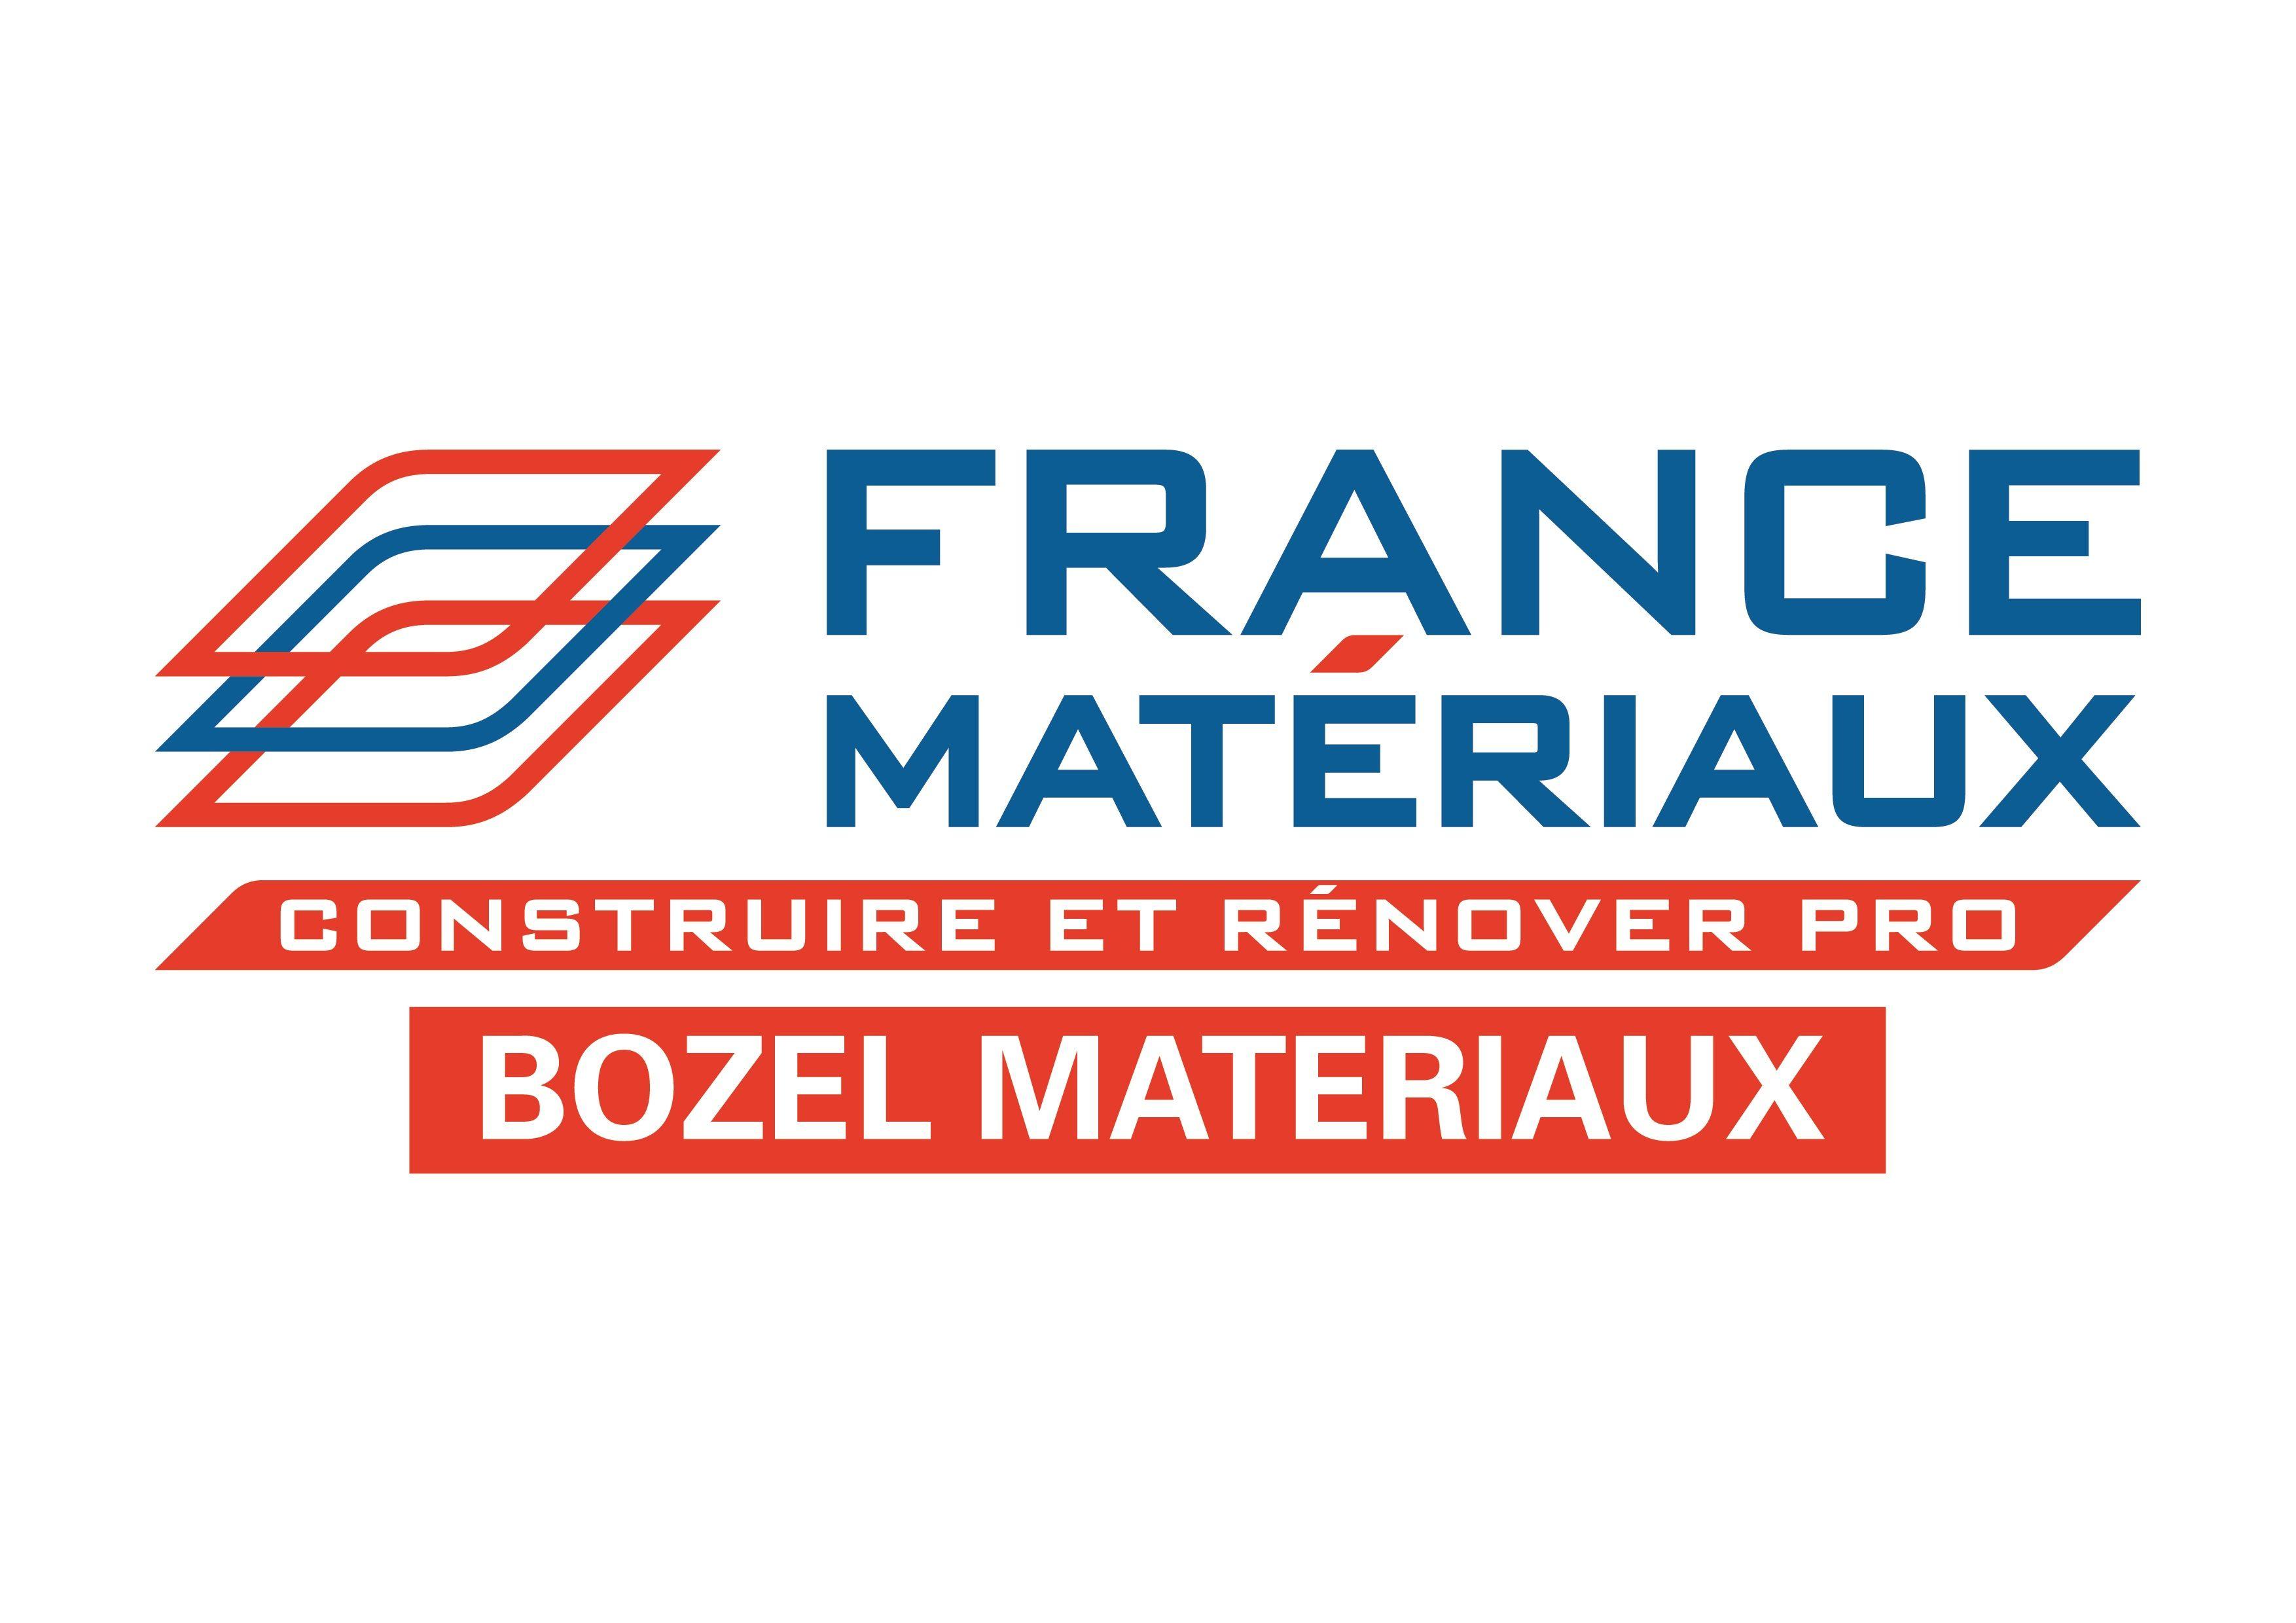 Bozel materiaux